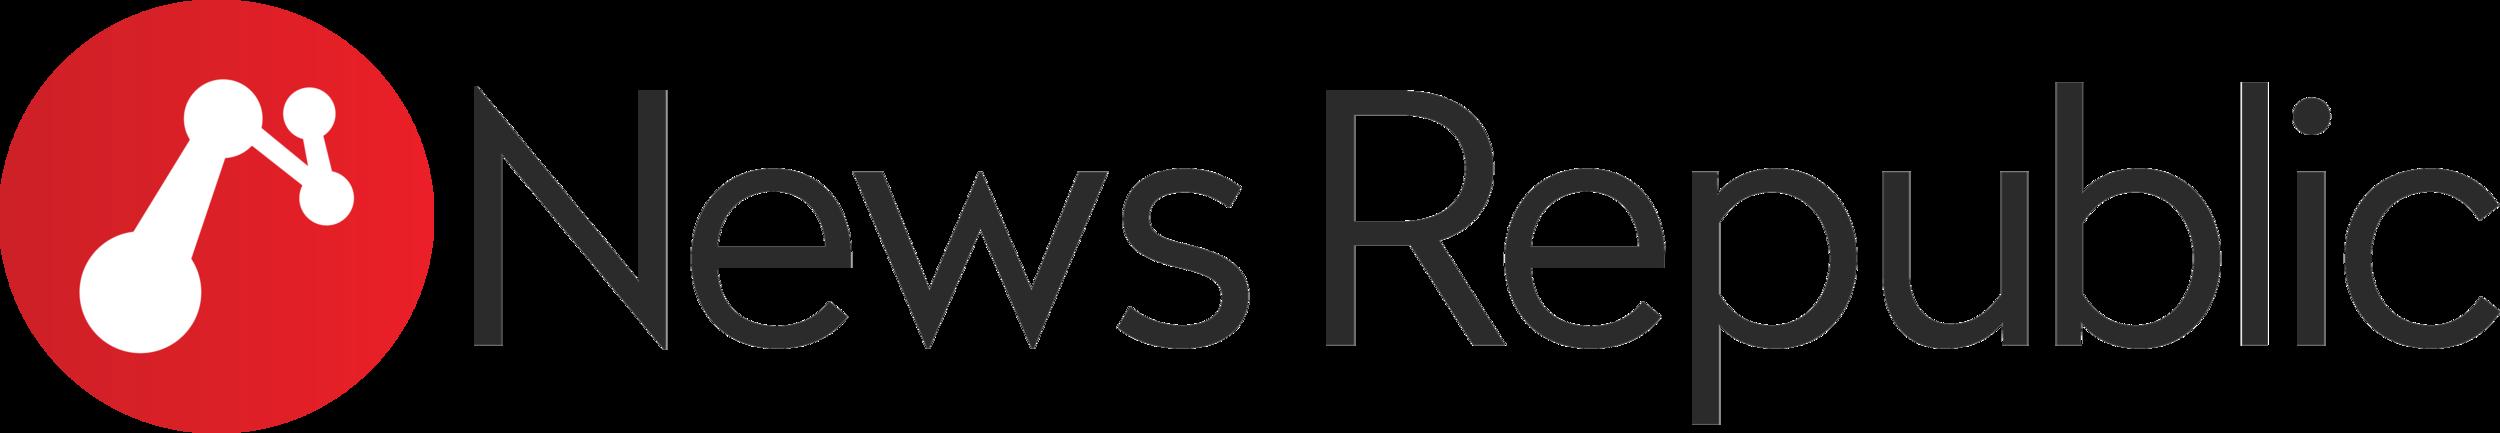 NewsRepublic_Logo.png